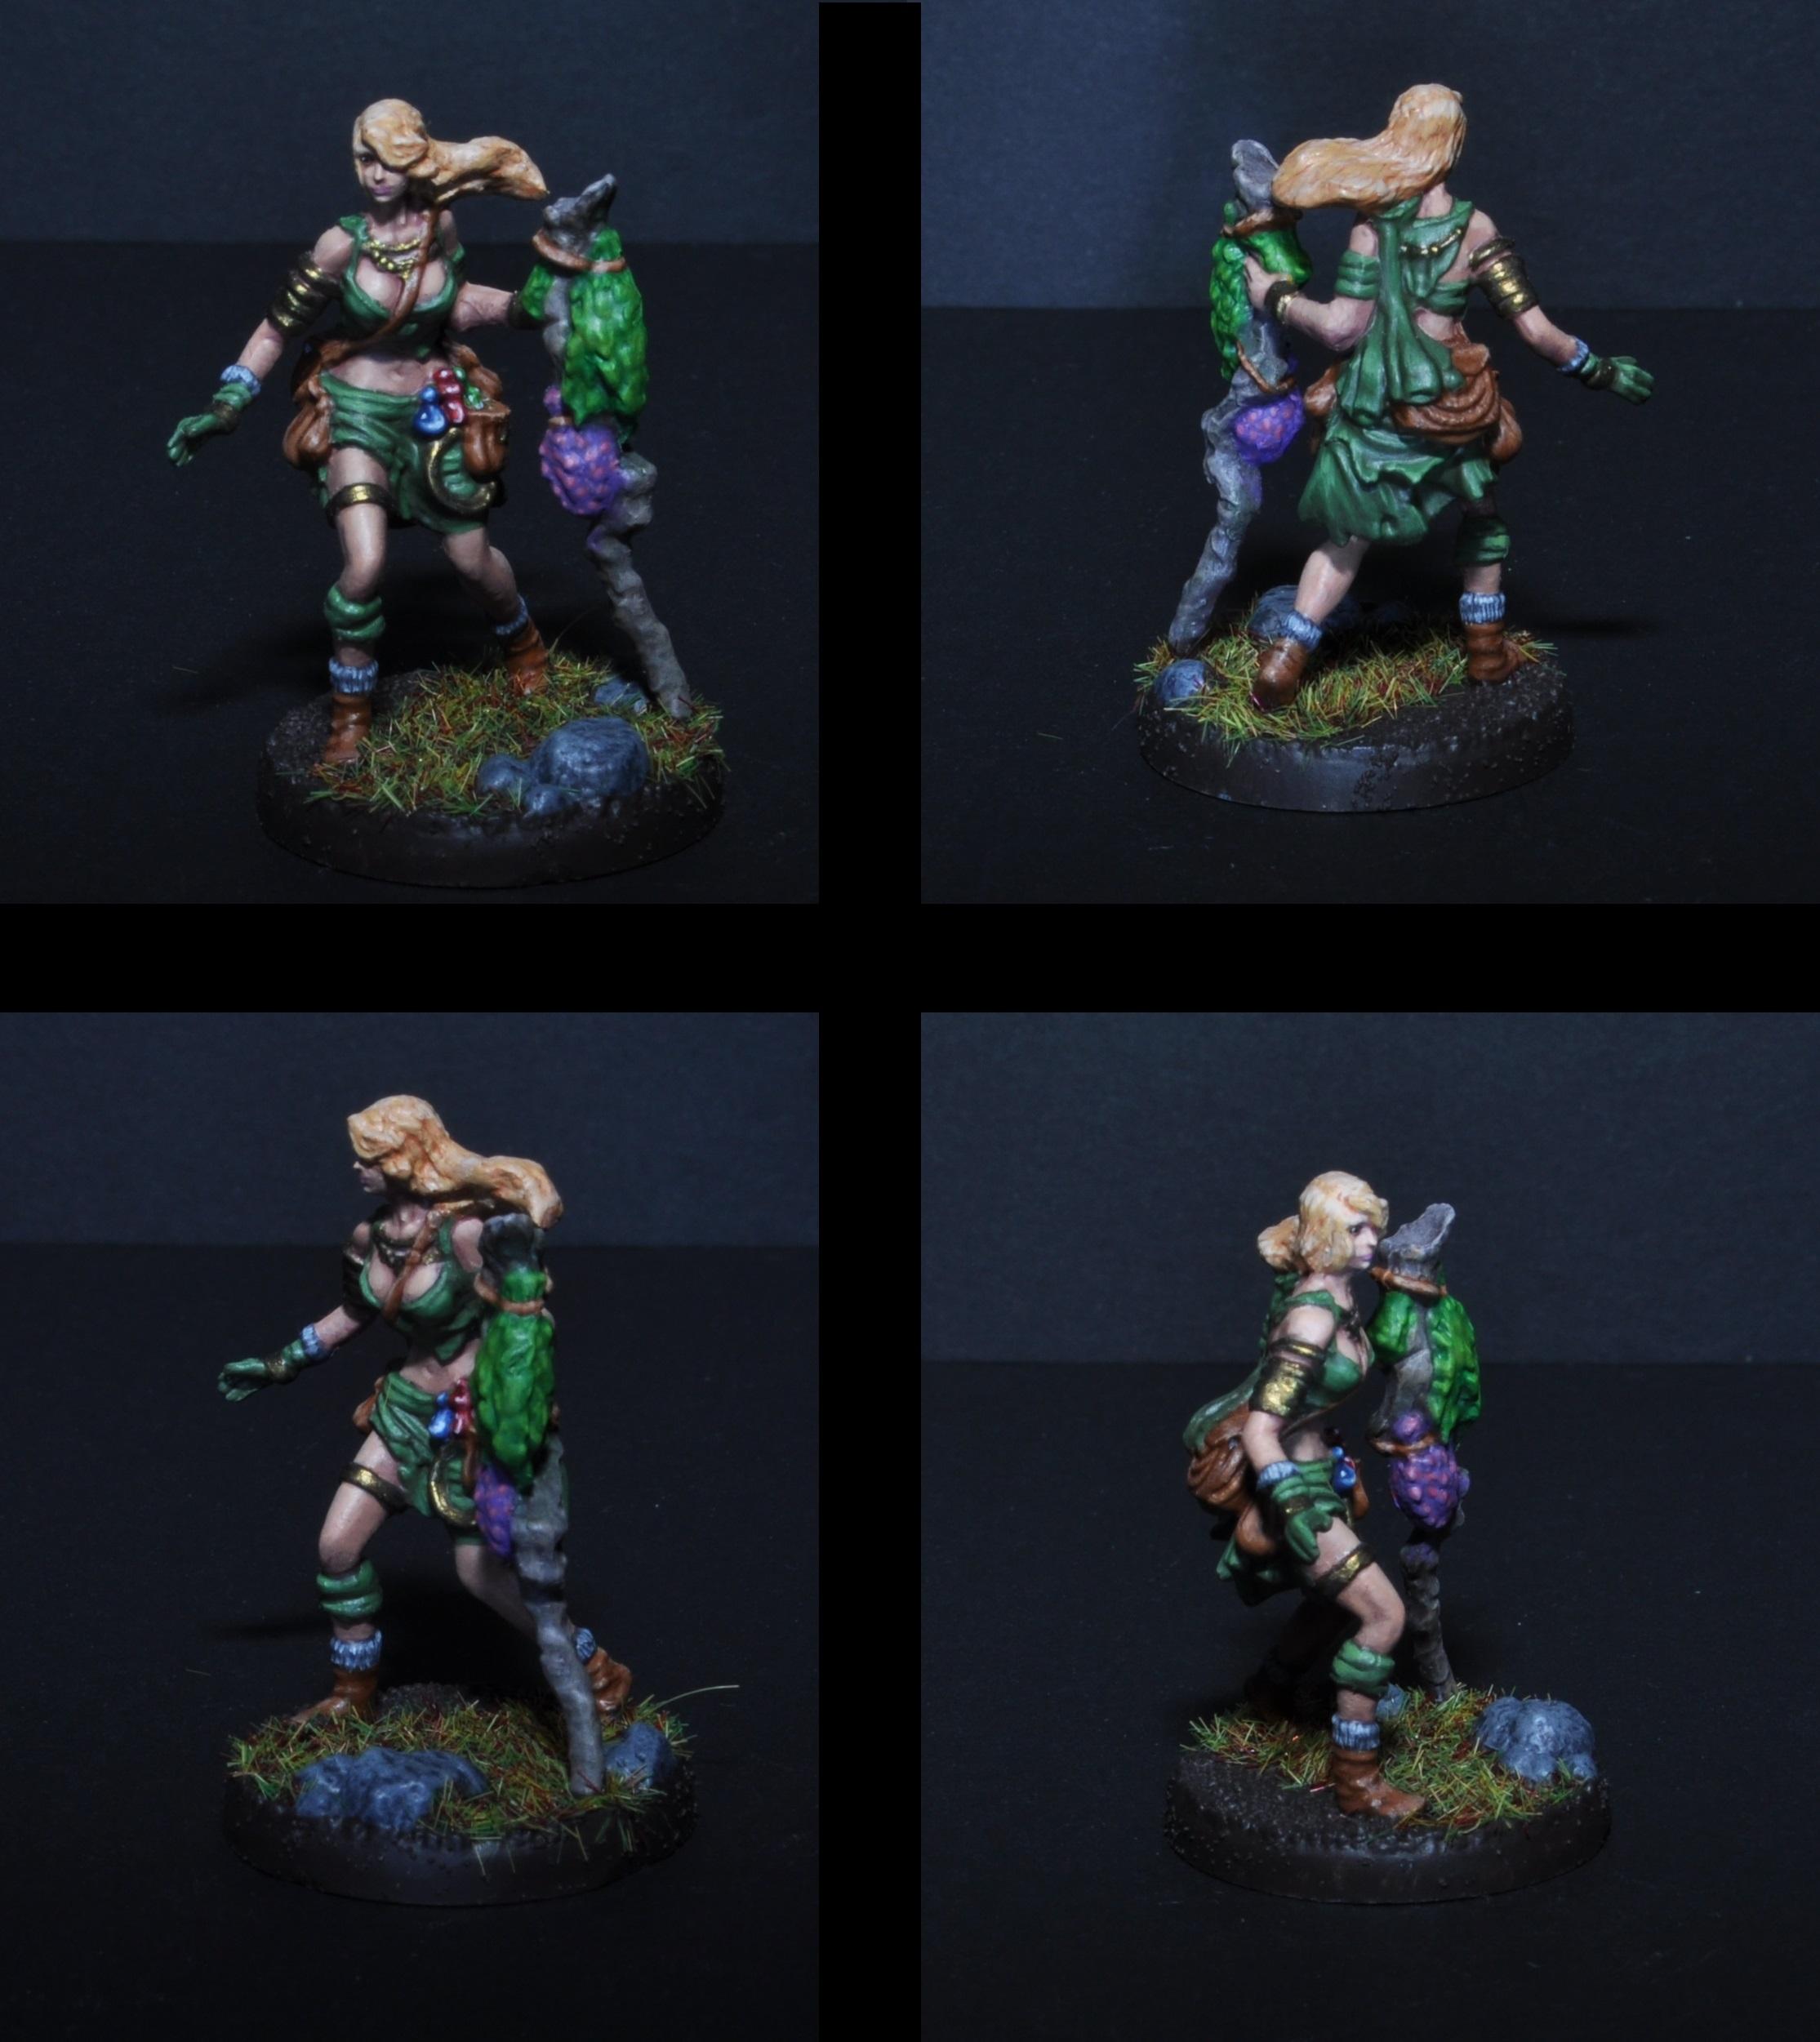 Ailei; Tainted Grail